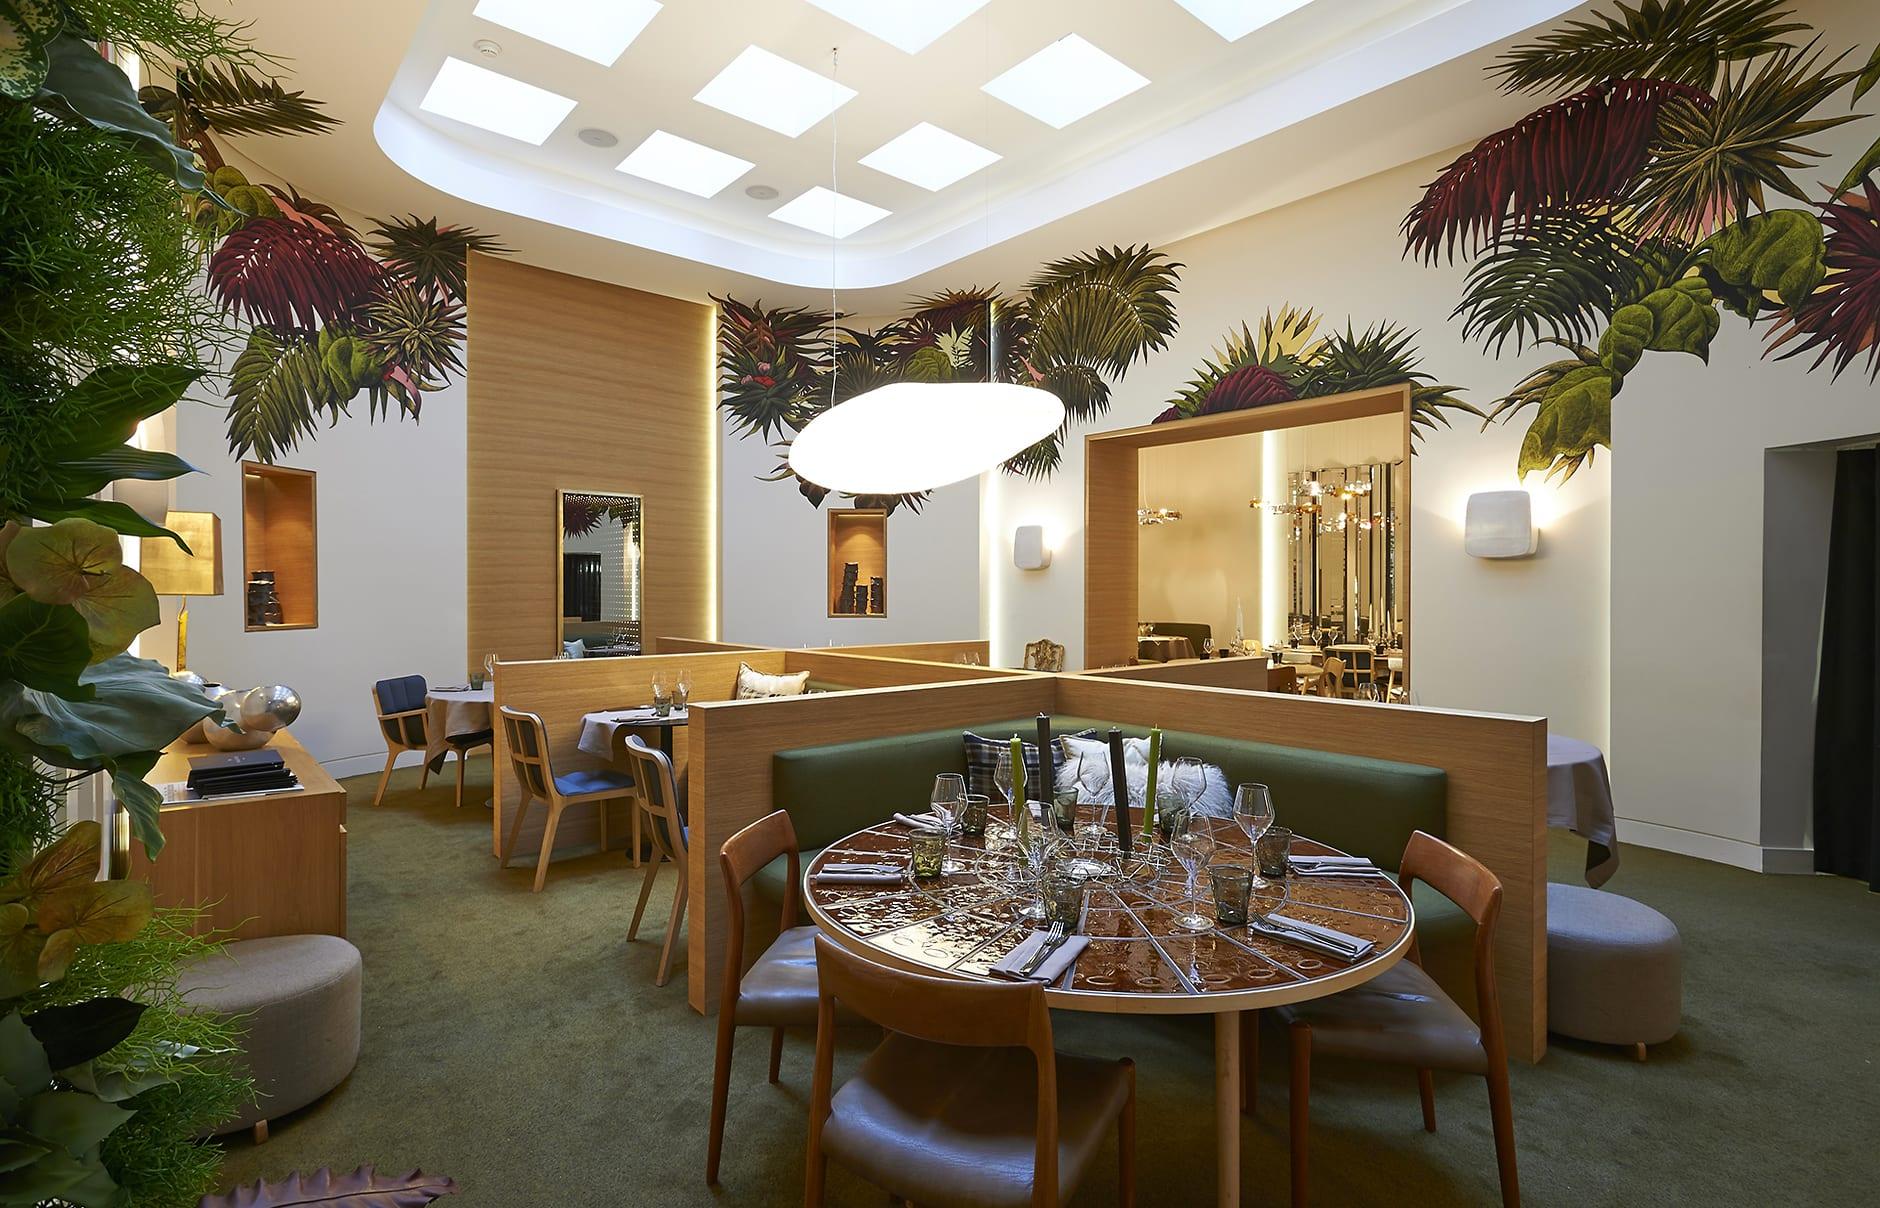 Restaurant. Marignan Paris, France. © Marignan